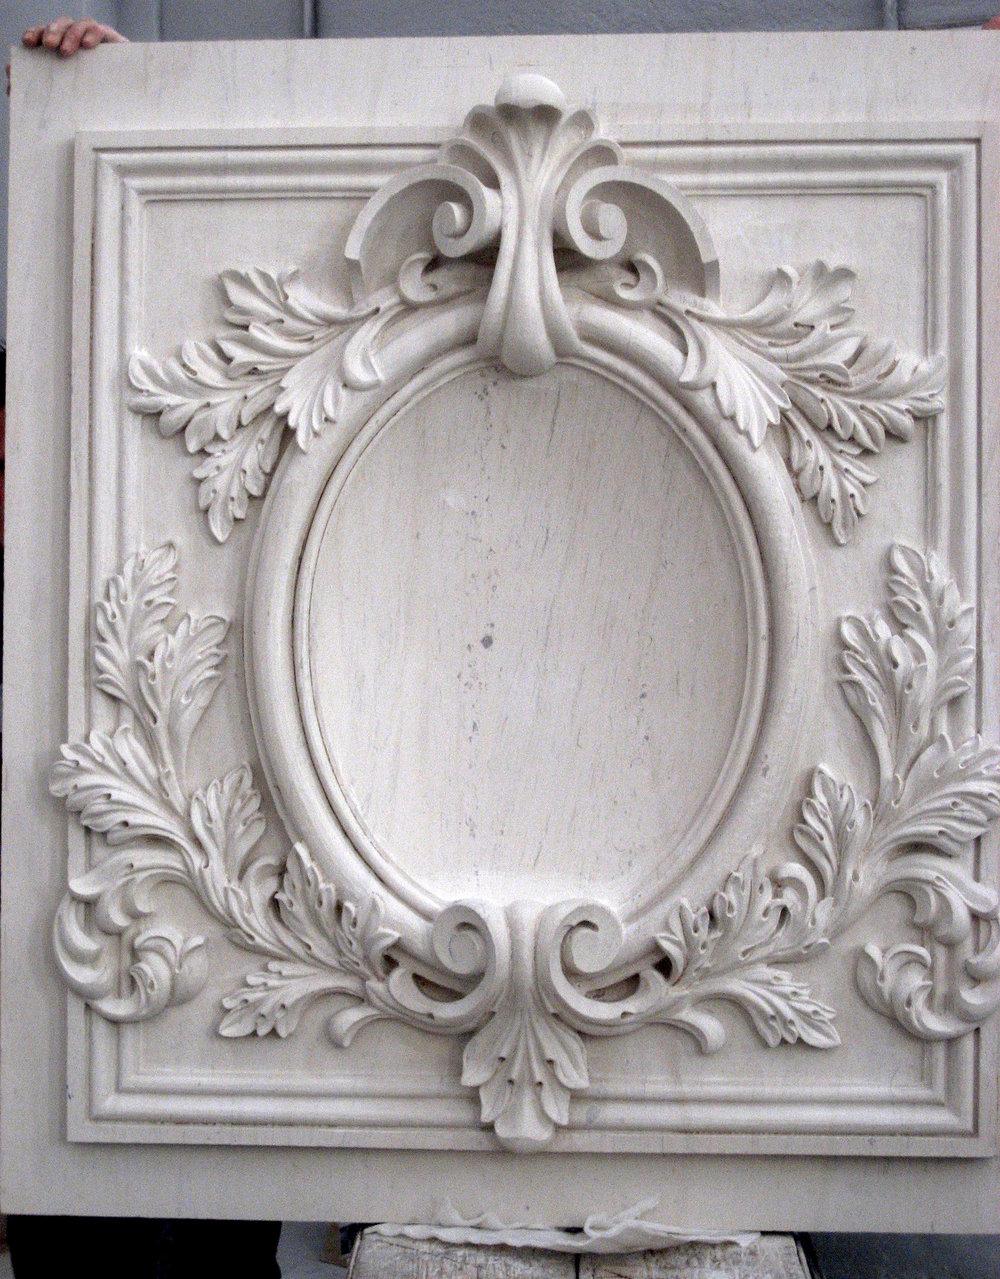 Nader-Damaghi-Carvings-010507-002---Copy.jpg